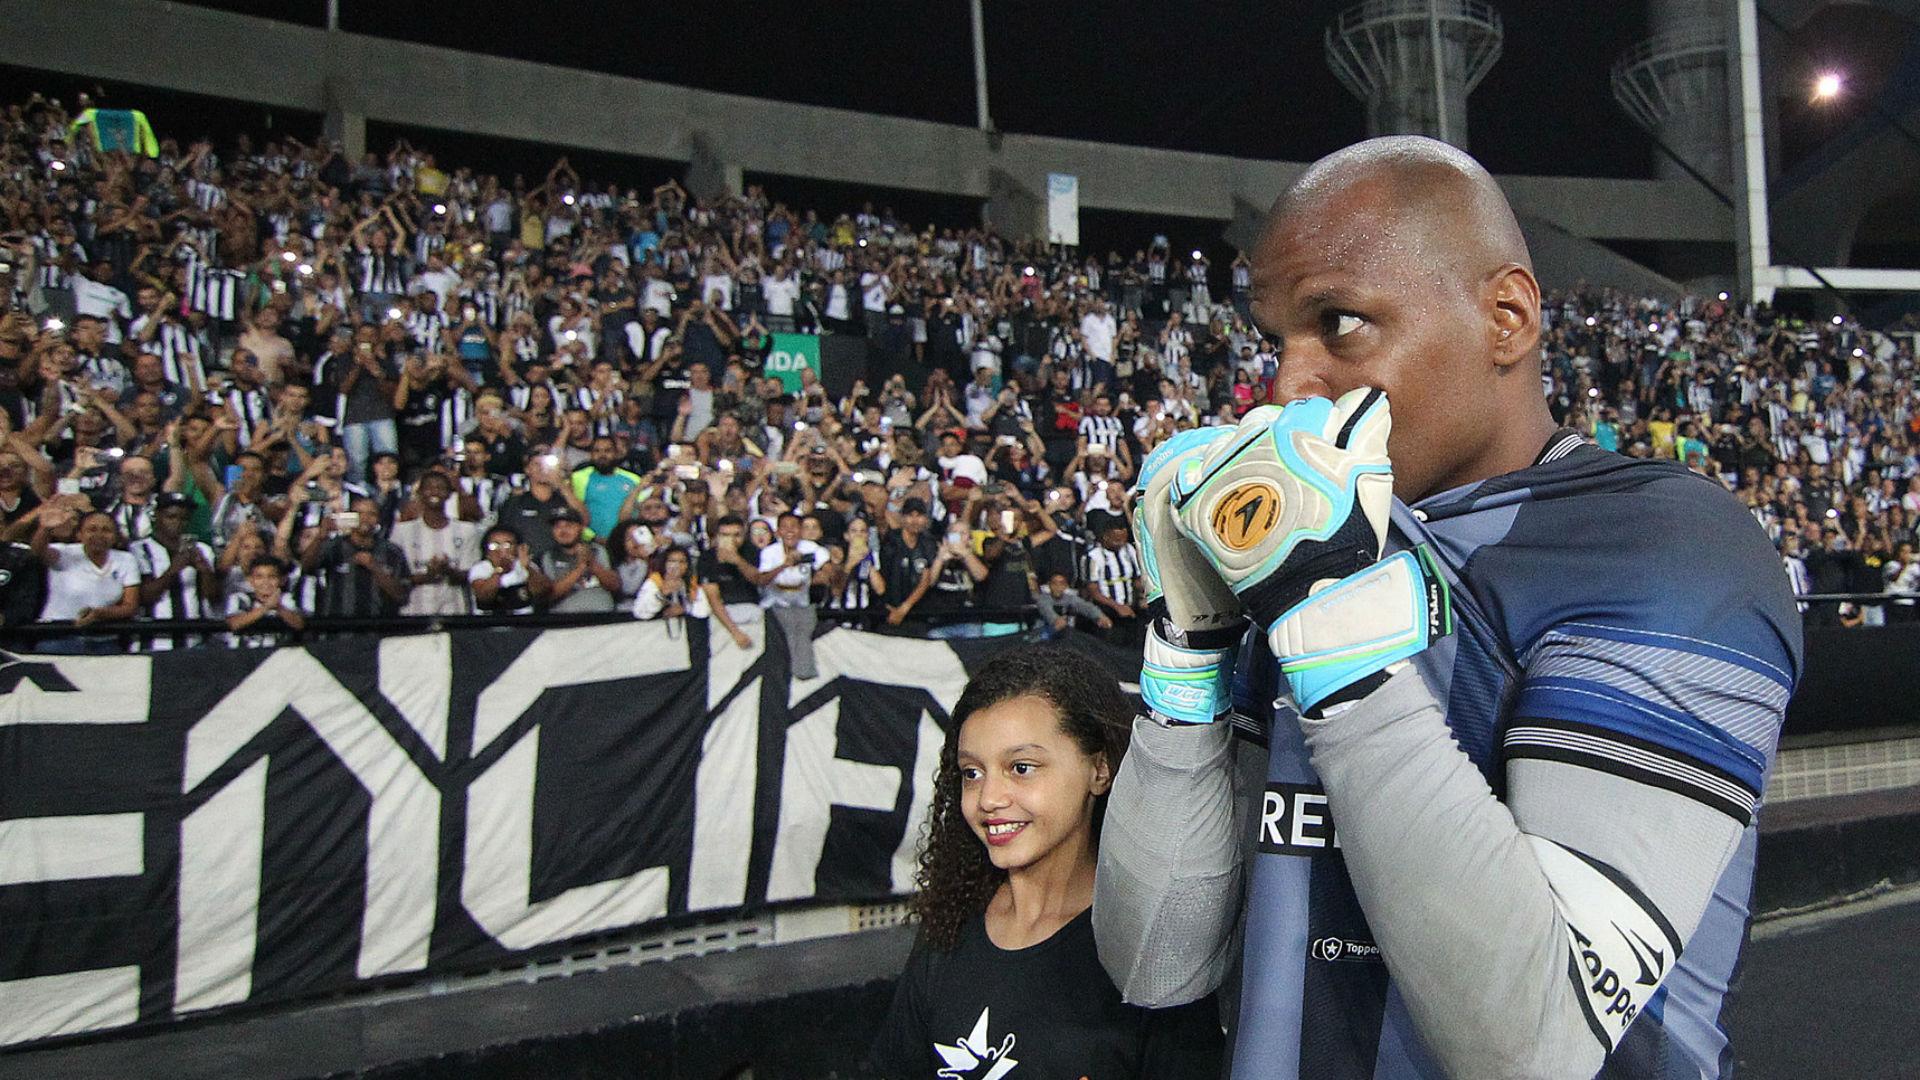 Jefferson Botafogo despedida 12 12 2018